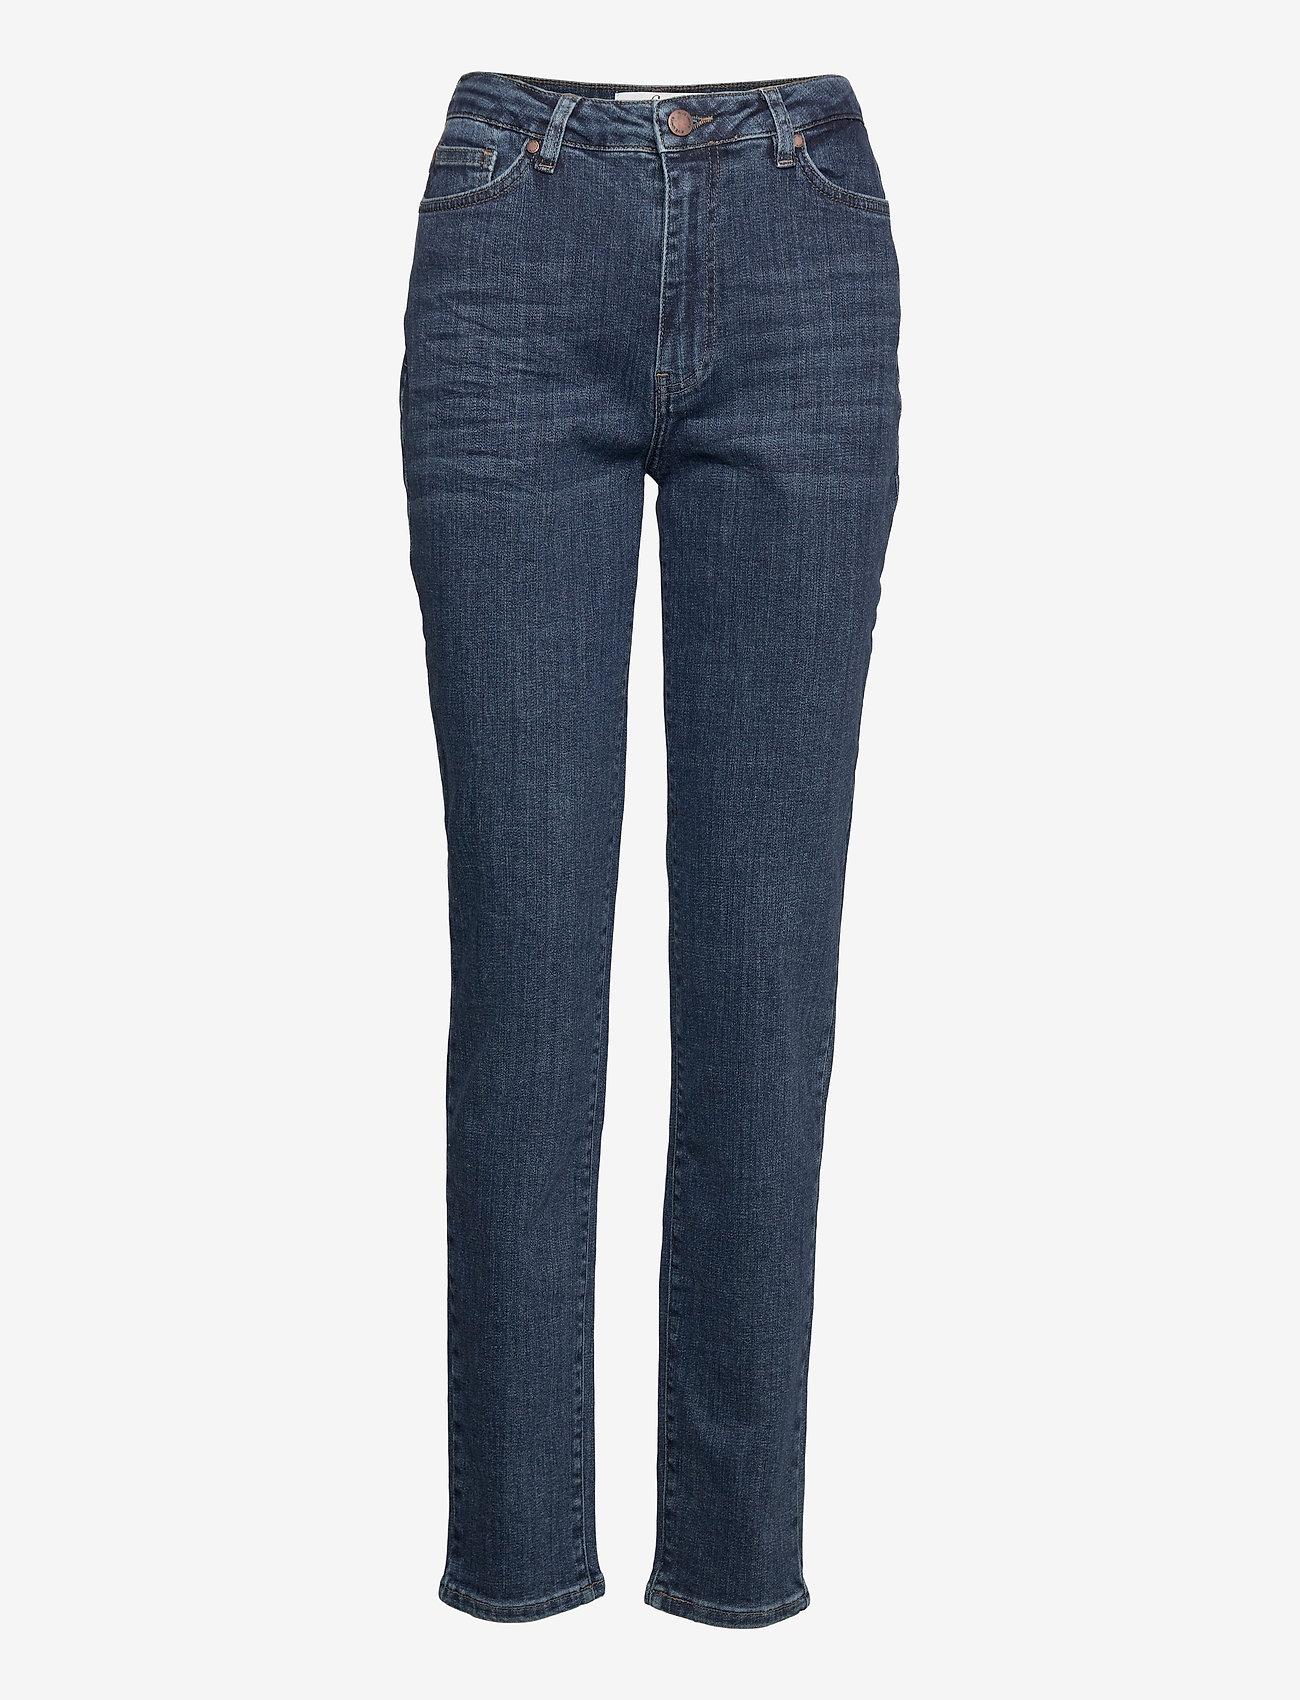 FIVEUNITS - Katelyn 241 - raka jeans - illusion blue auto - 0